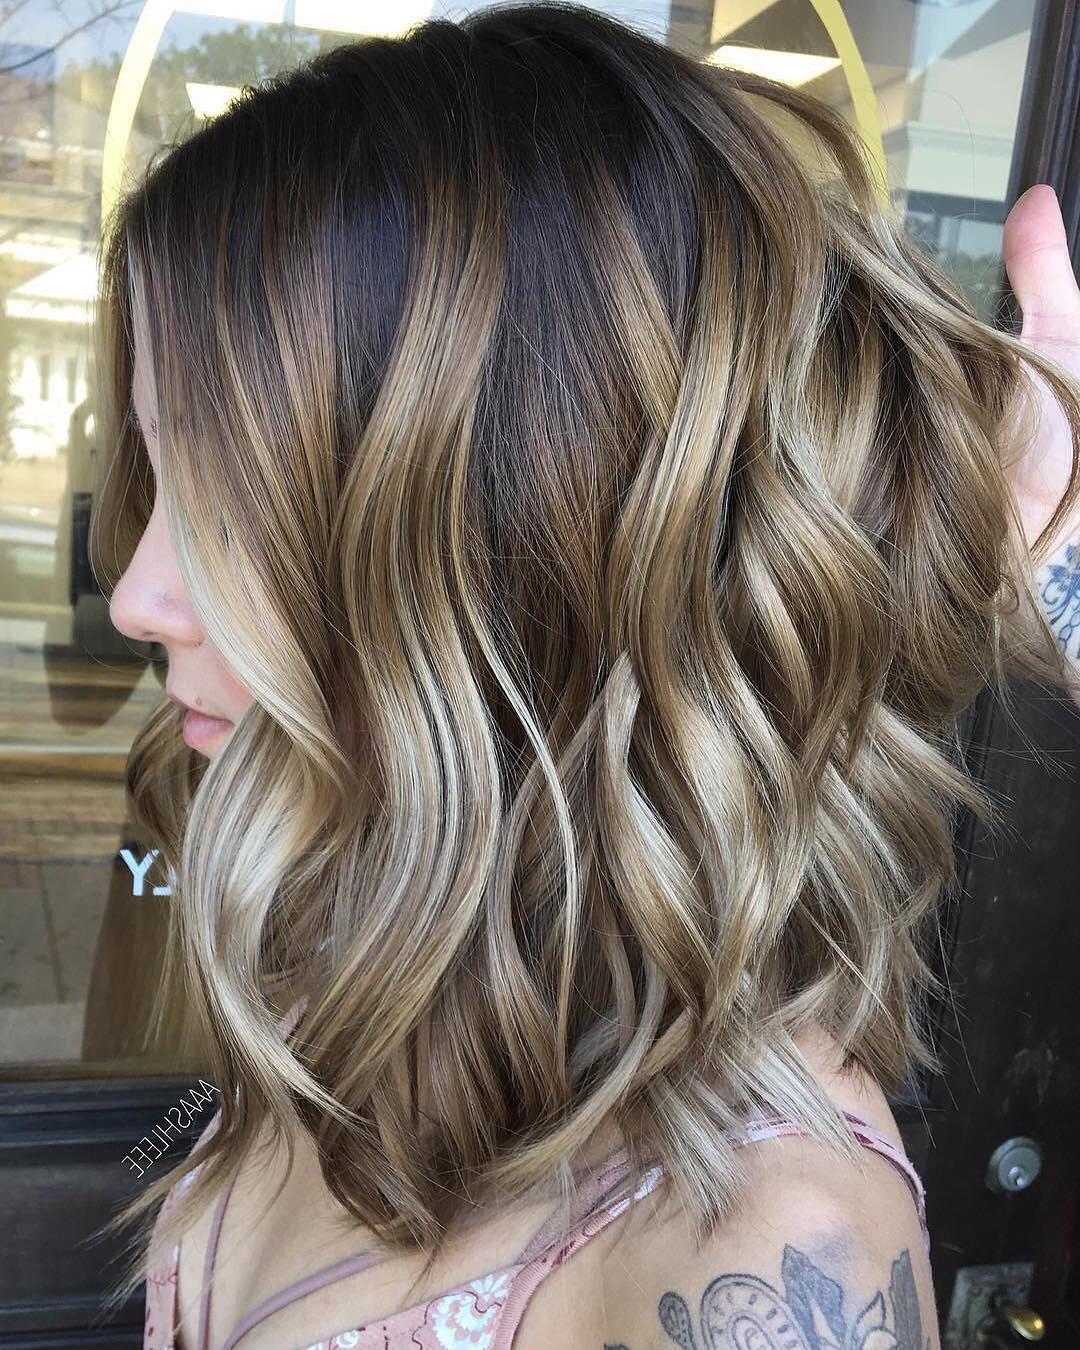 10 Ombre Balayage Hairstyles for Medium Length Hair, Hair ...